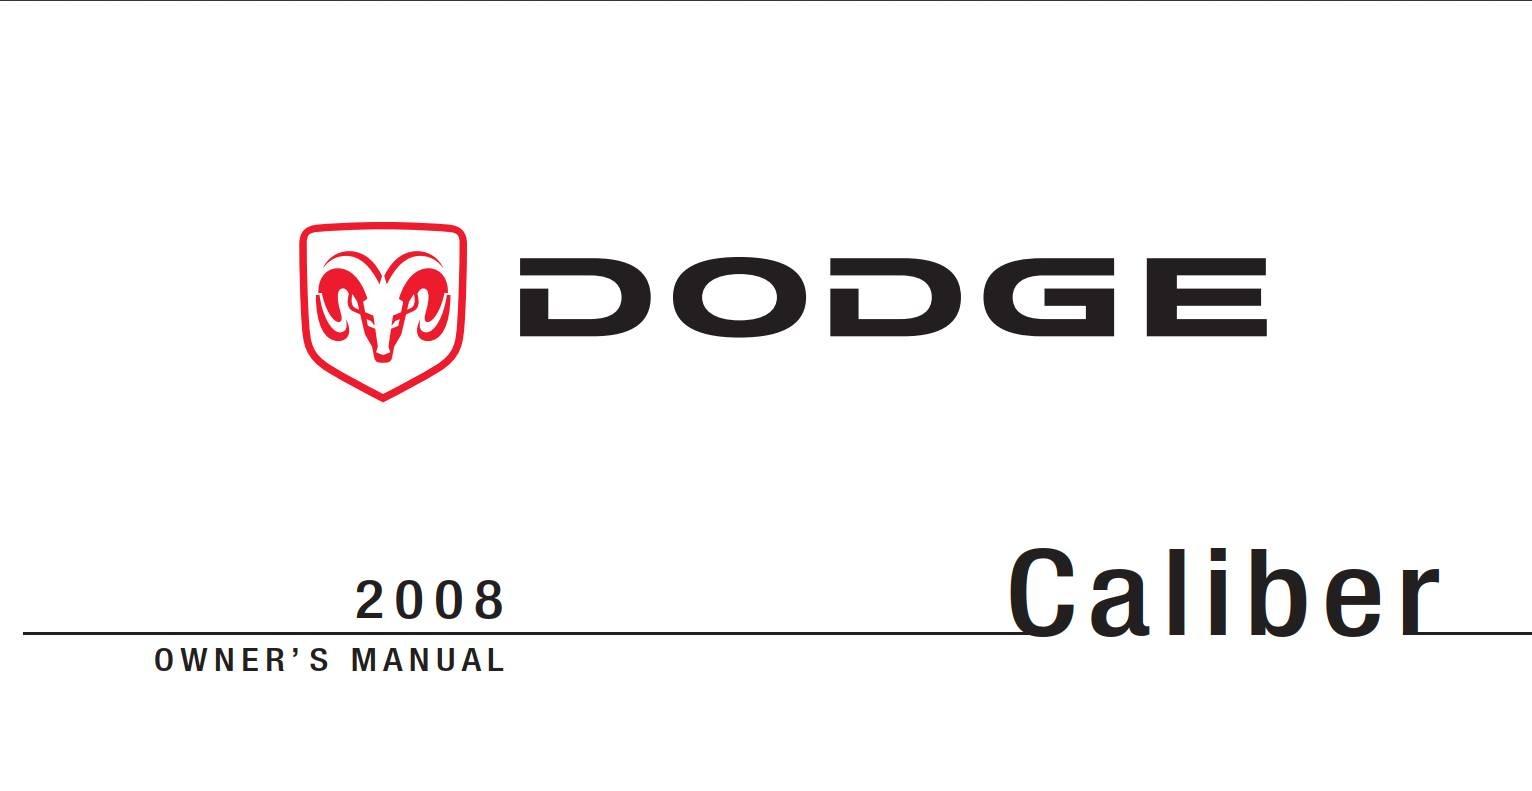 Dodge Caliber 2008 Owner's Manual